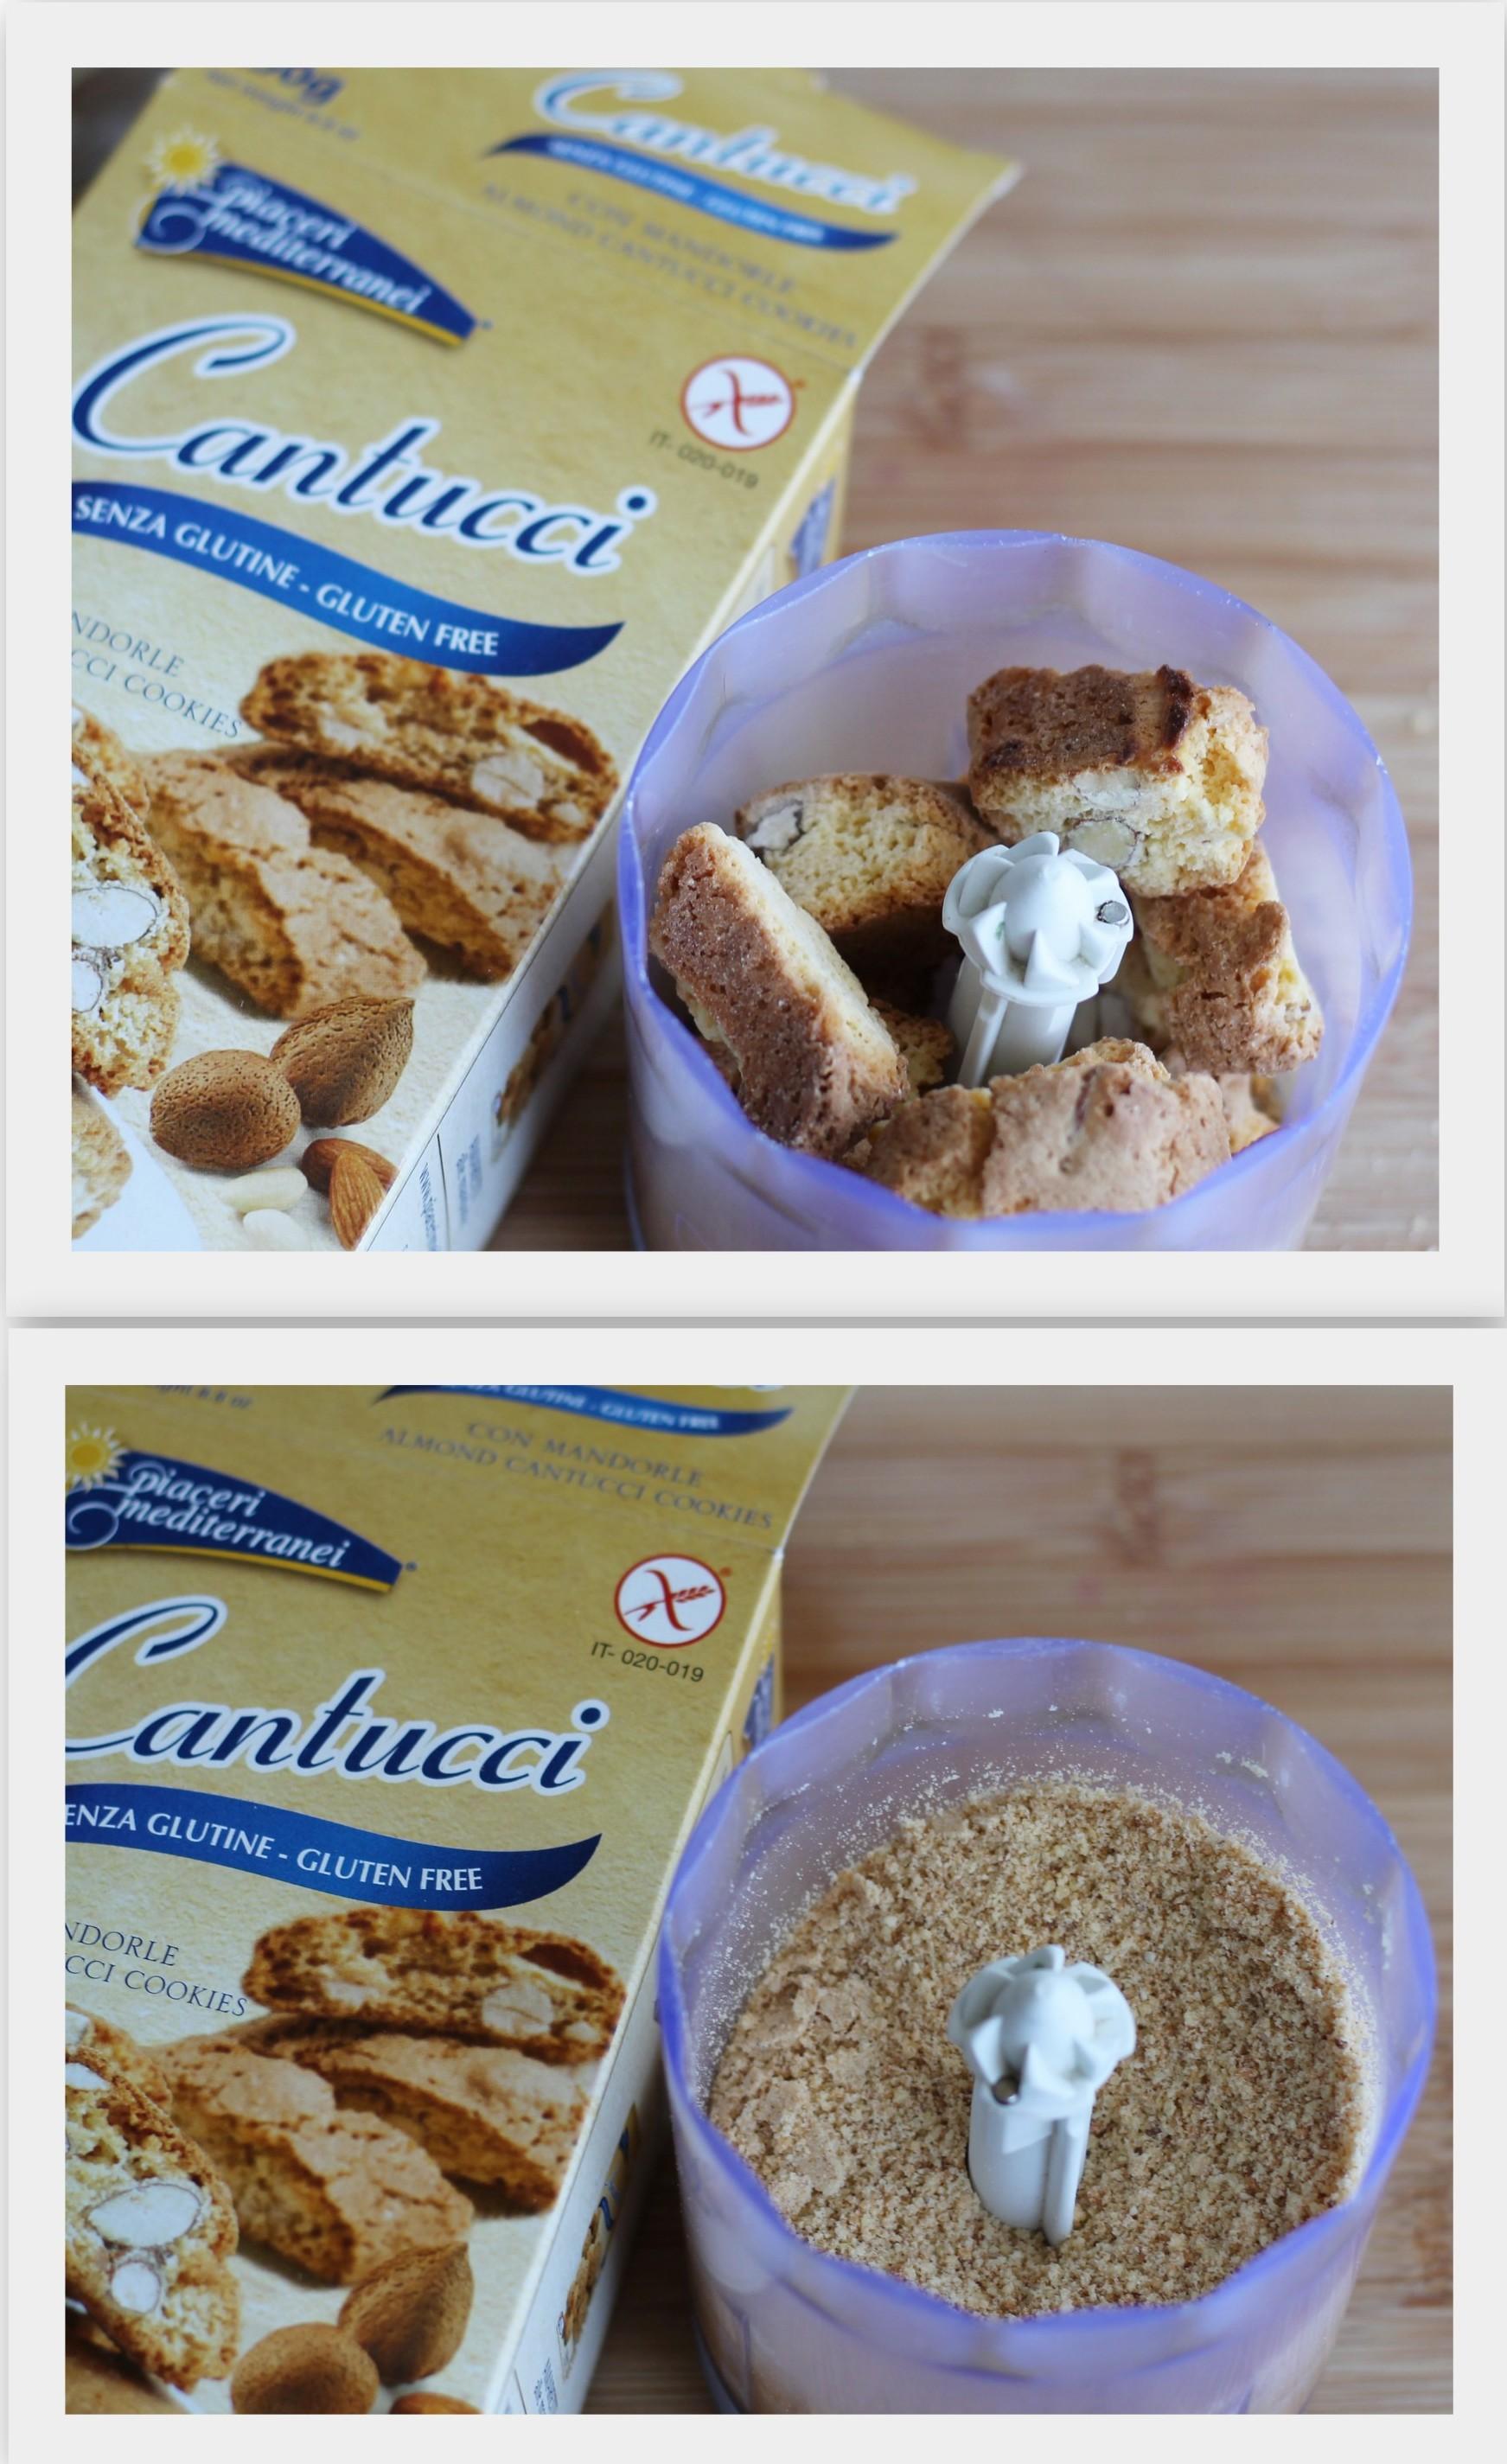 Strudel sans gluten avec cerises - La Cassata